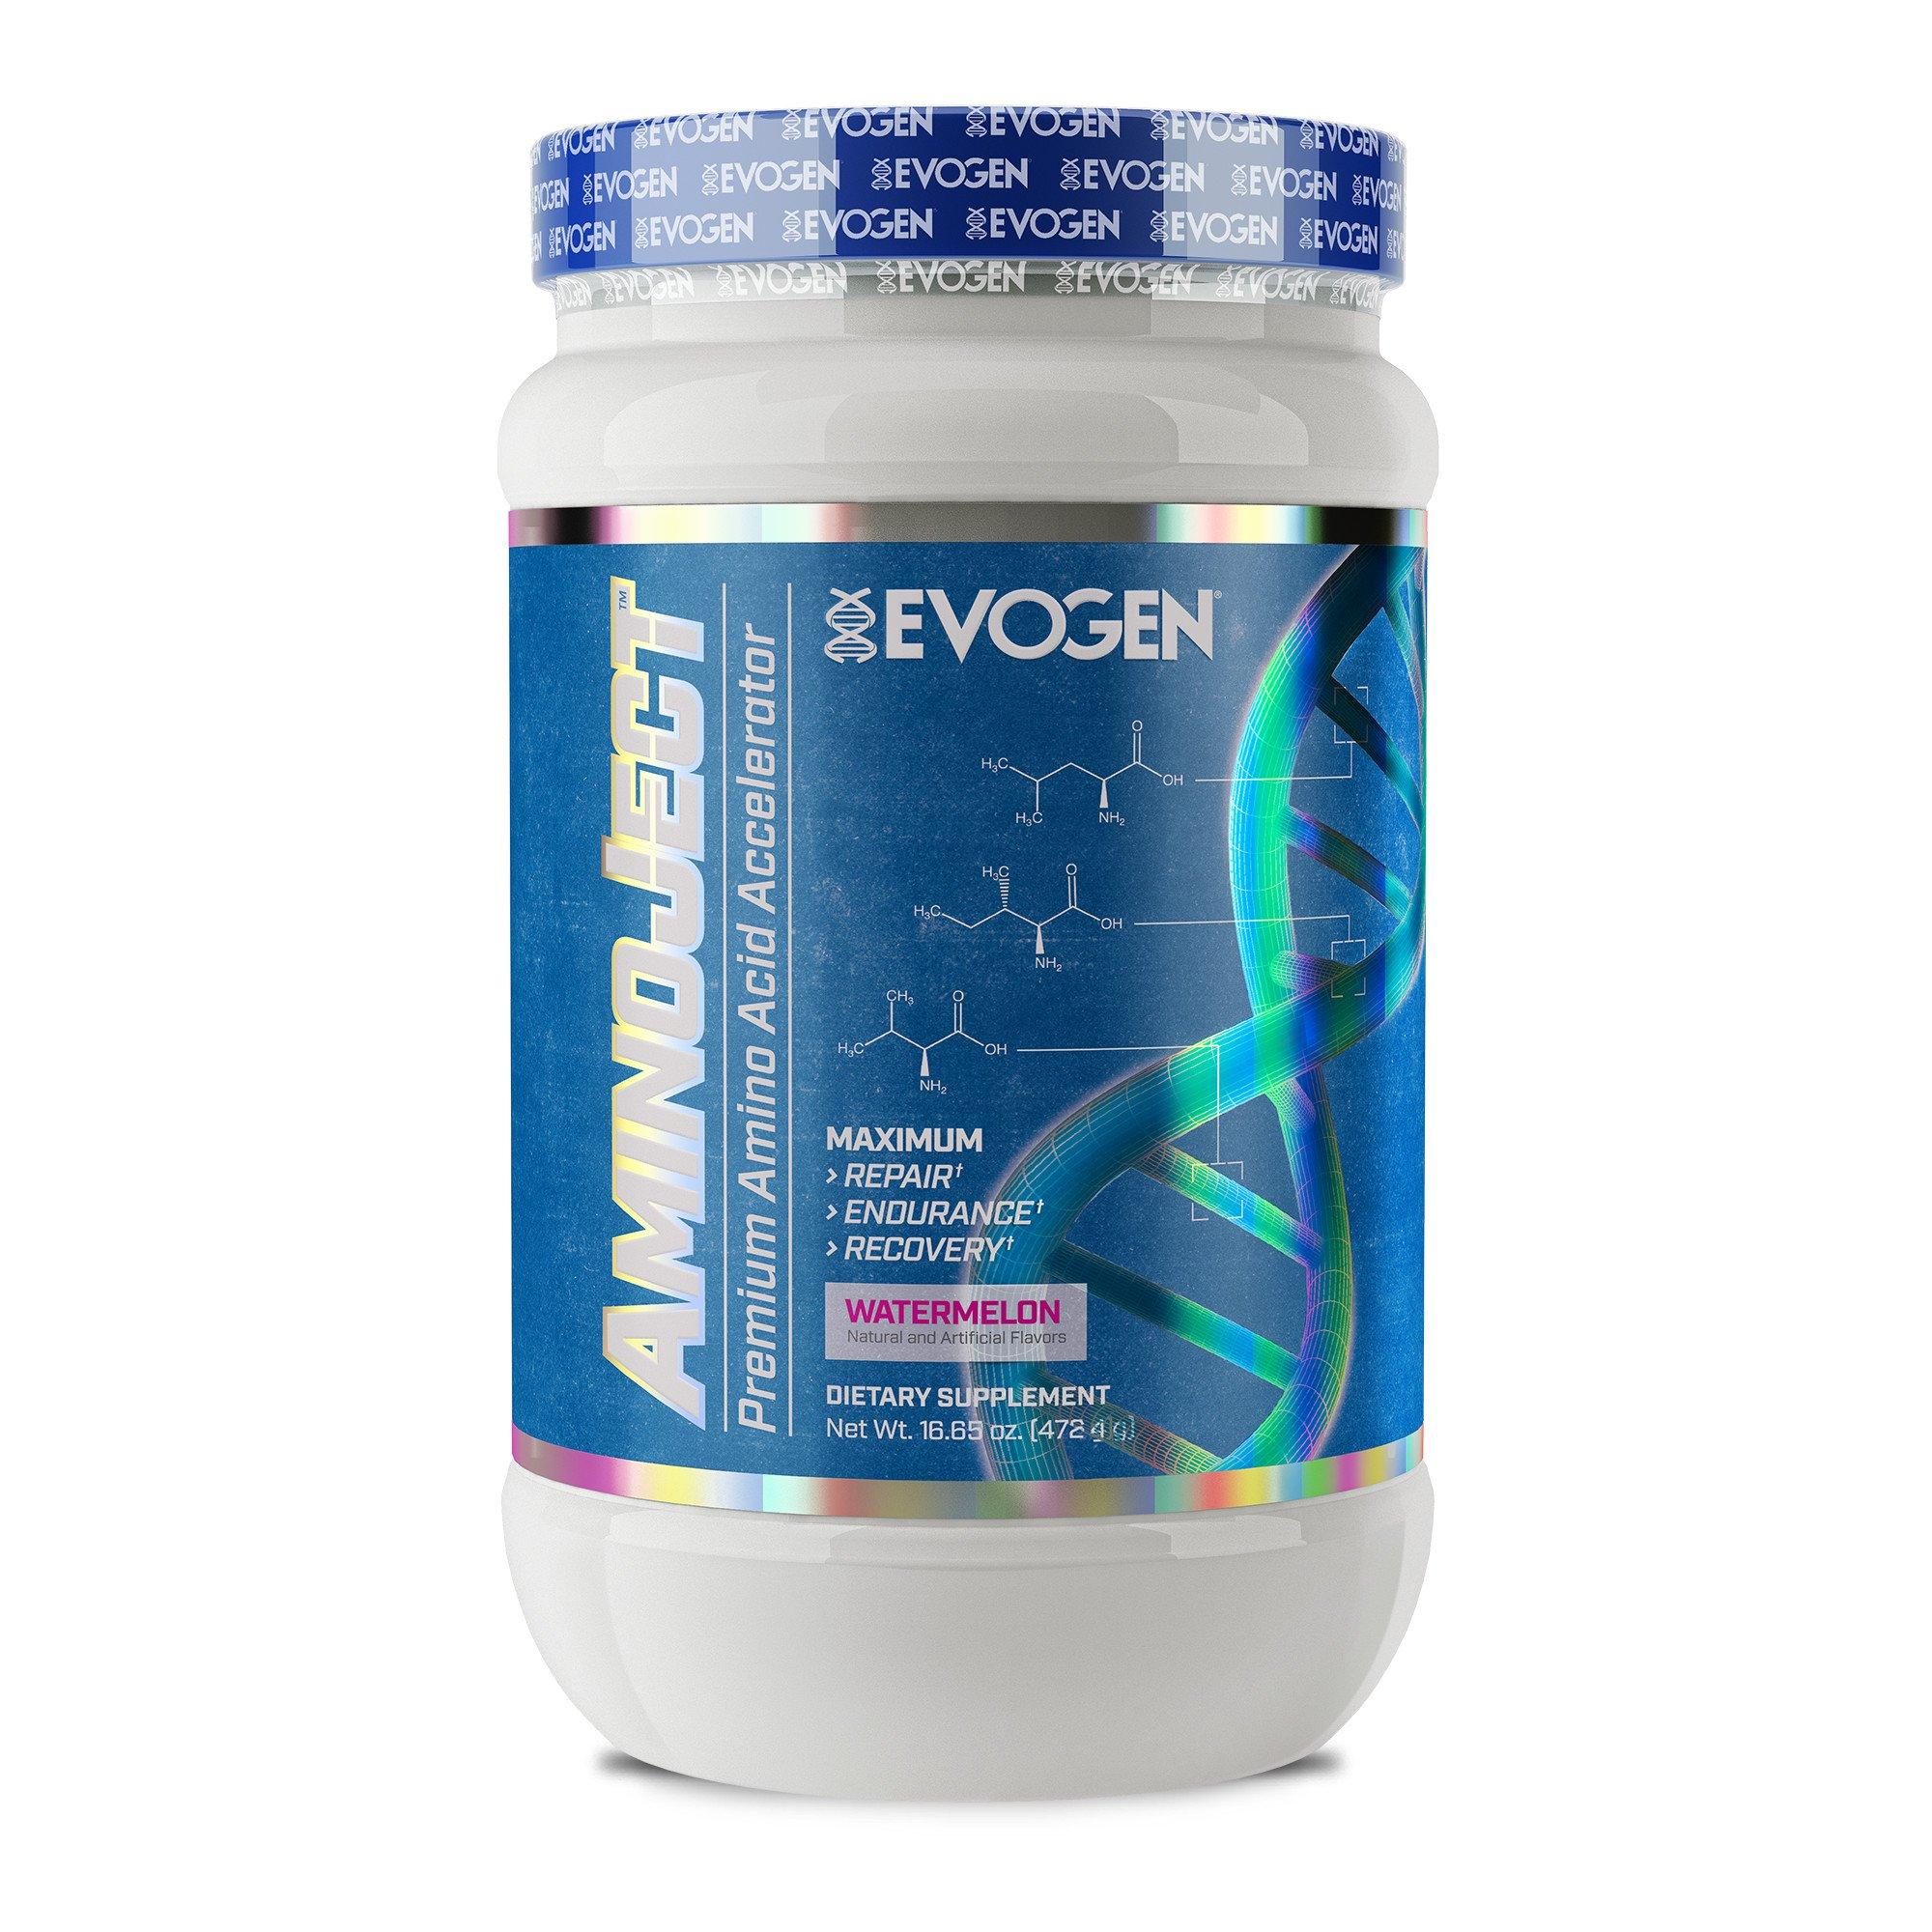 Evogen AminoJect   Vegan Fermented Plant Based BCAA, Glutamine, Citrulline Powder   Watermelon   30 Servings